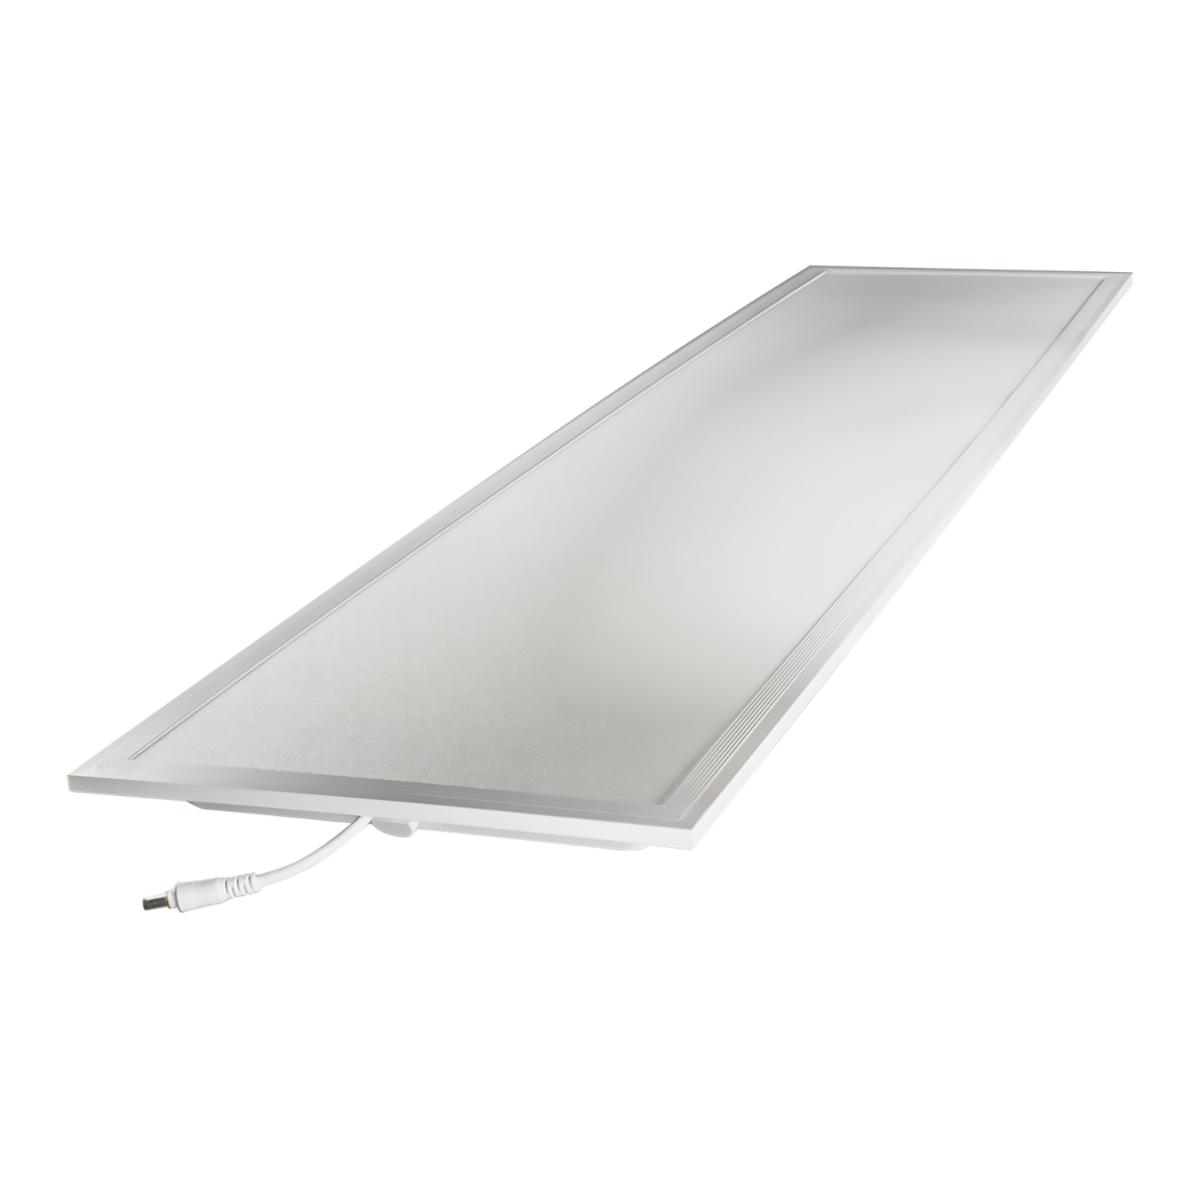 Noxion LED Panel Delta Pro V2.0 Xitanium DALI 30W 30x120cm 4000K 4110lm UGR <19 | Dali Dimmbar - Kaltweiß - Ersatz für 2x36W